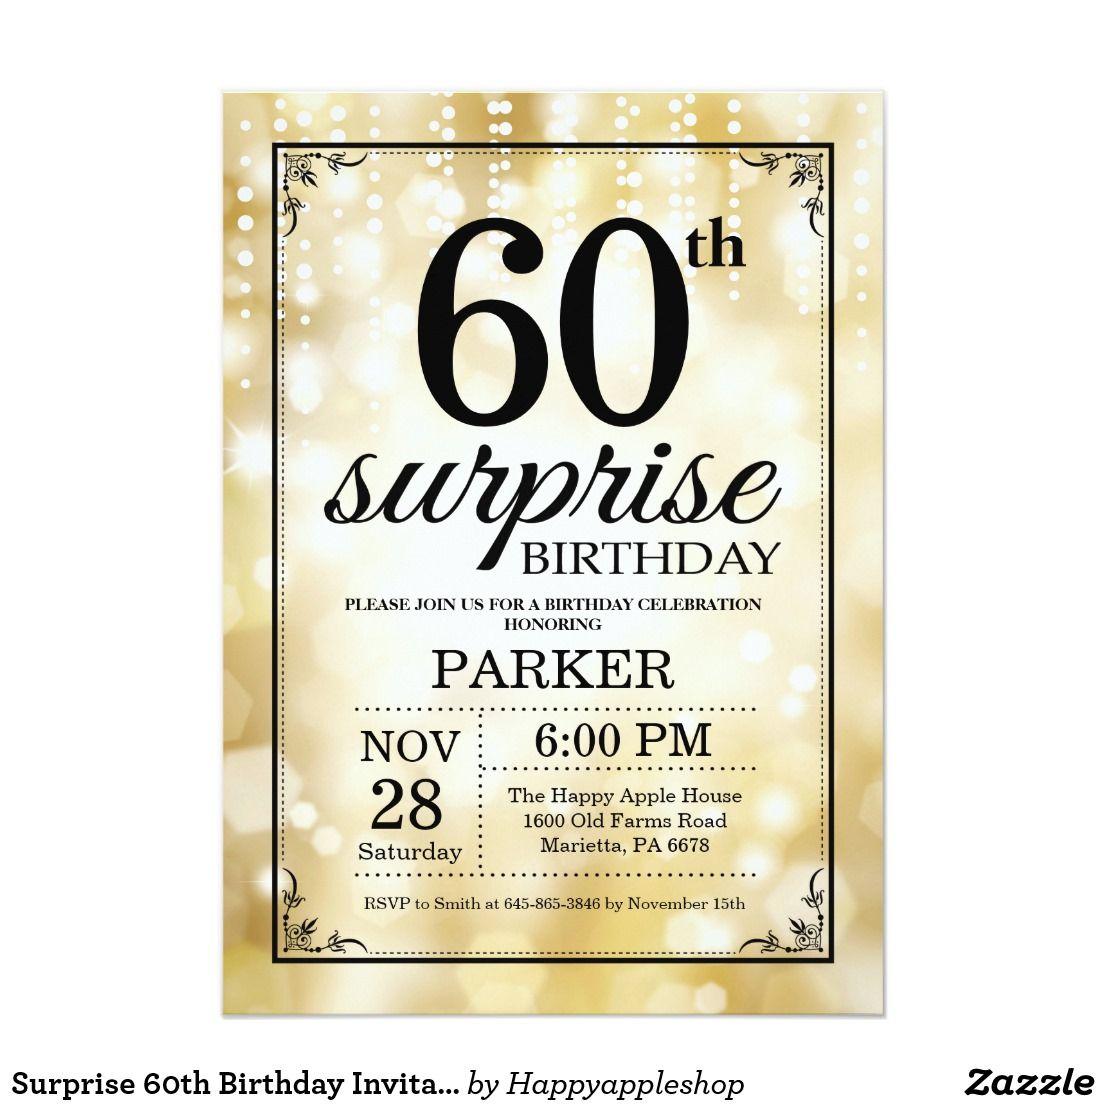 Surprise 60th Birthday Invitation Gold Glitter | Birthday Invitation ...